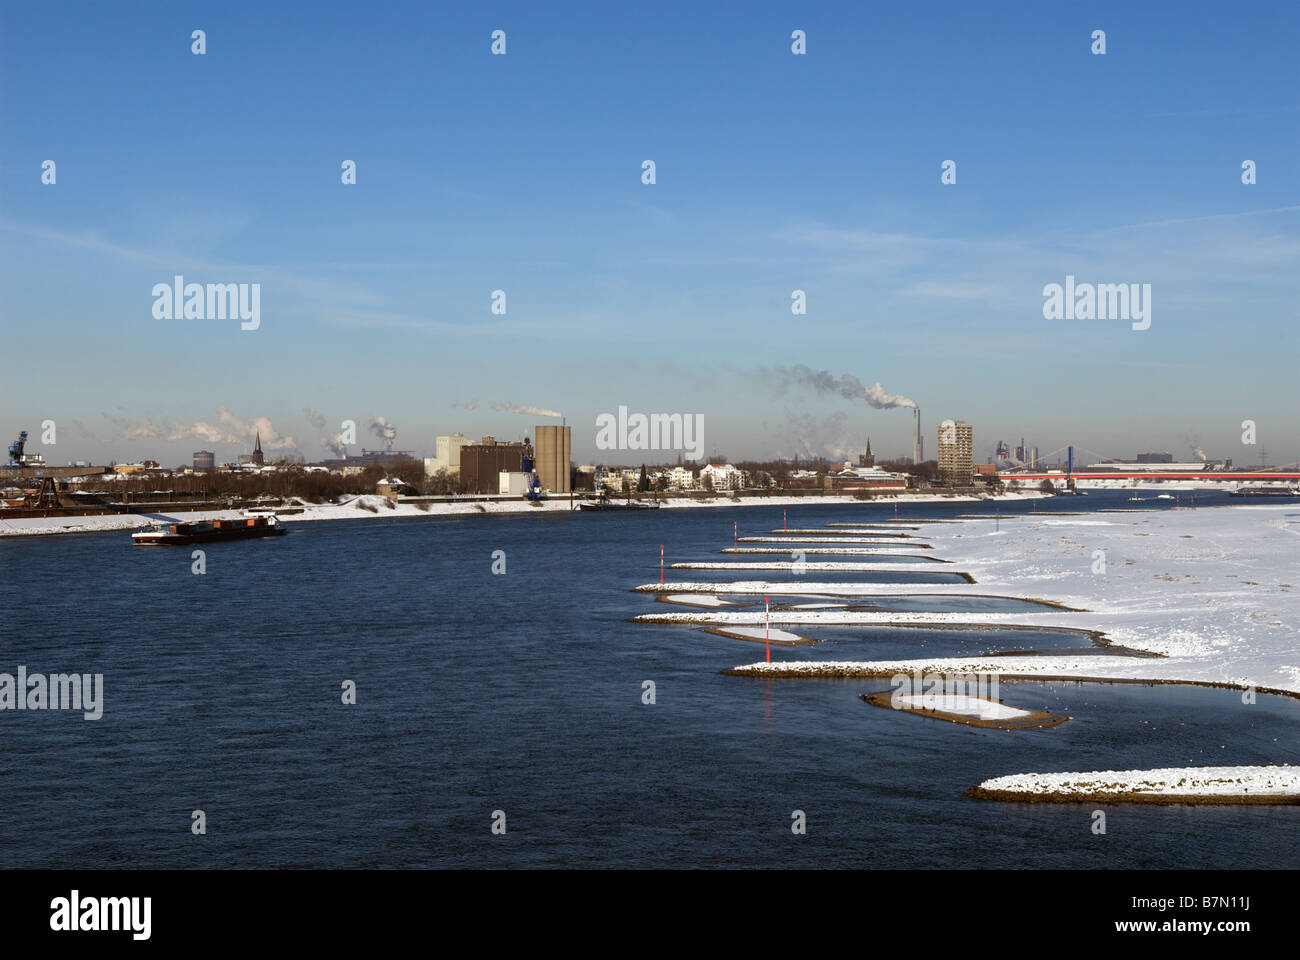 River Rhine, Duisburg, North Rhine-Westphalia, Germany. Stock Photo